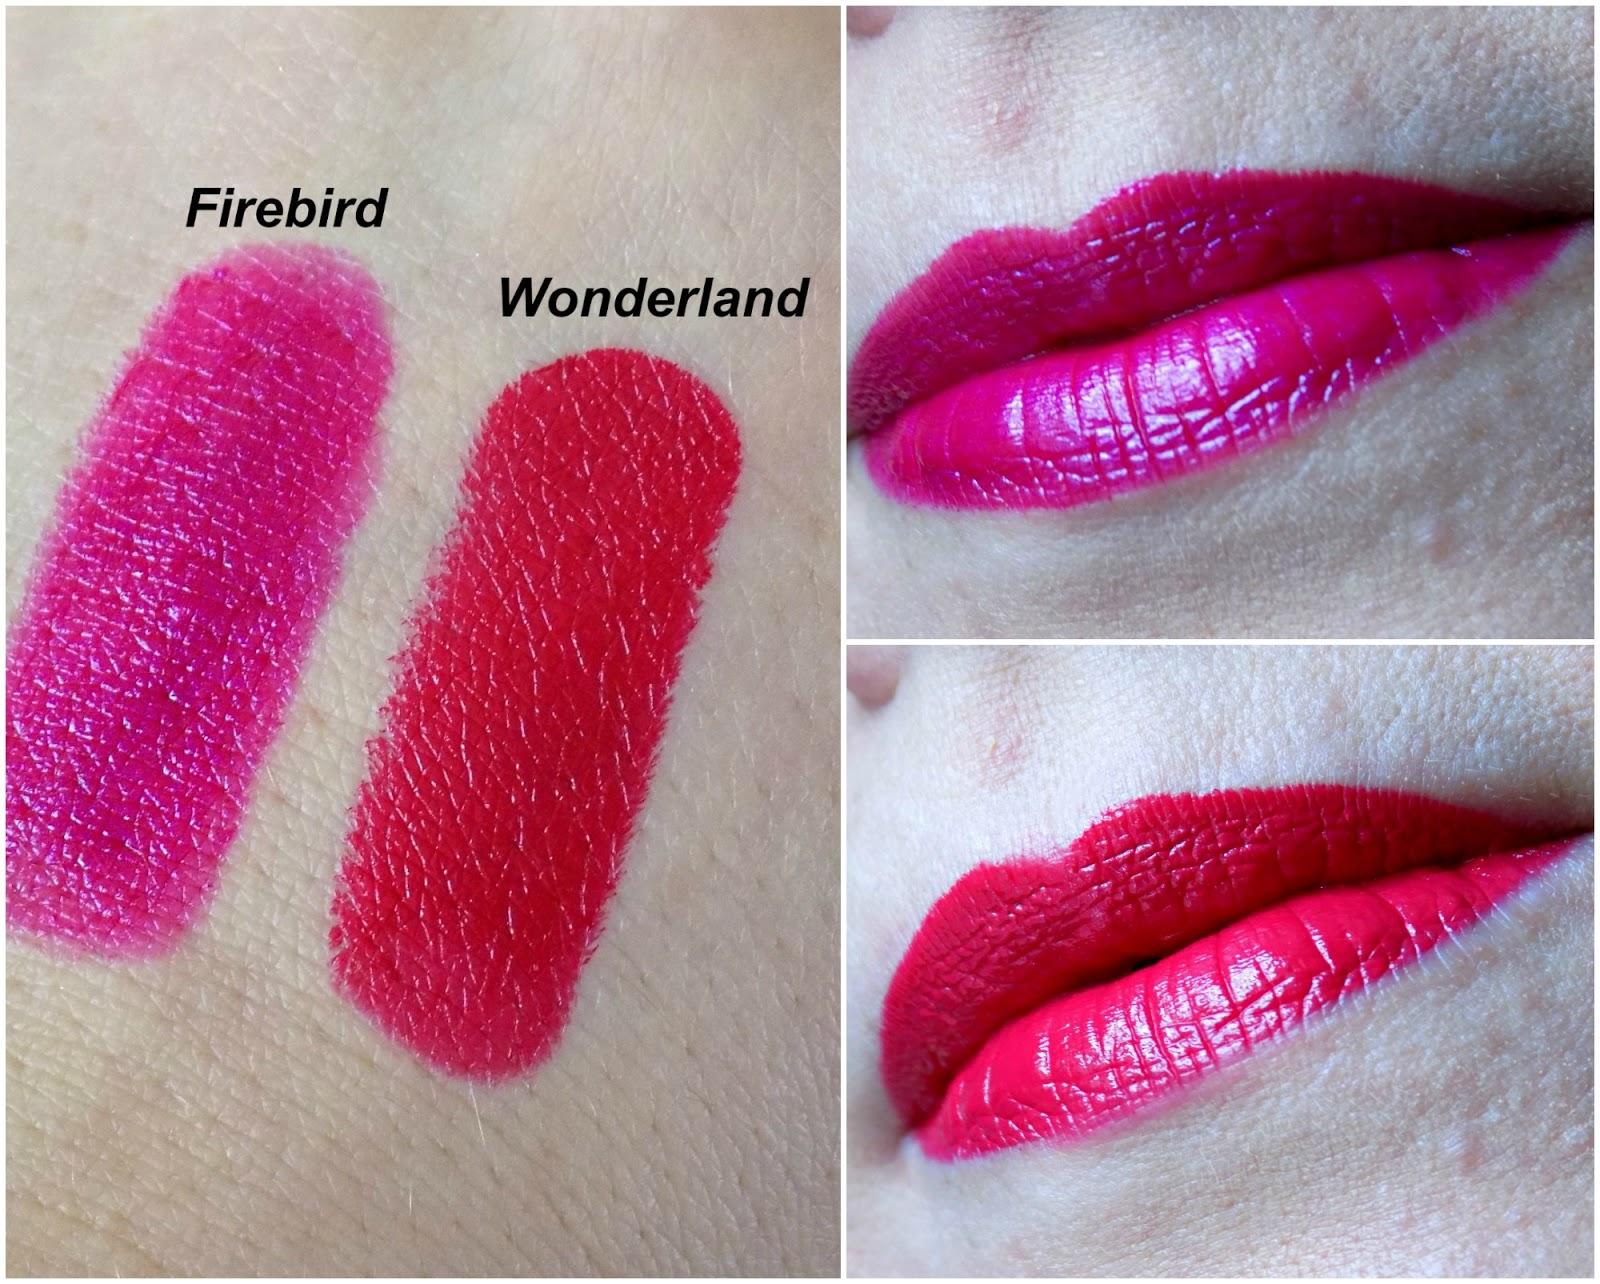 Urban Decay & Gwen Stefani lipsticks, Firebird and Wonderland